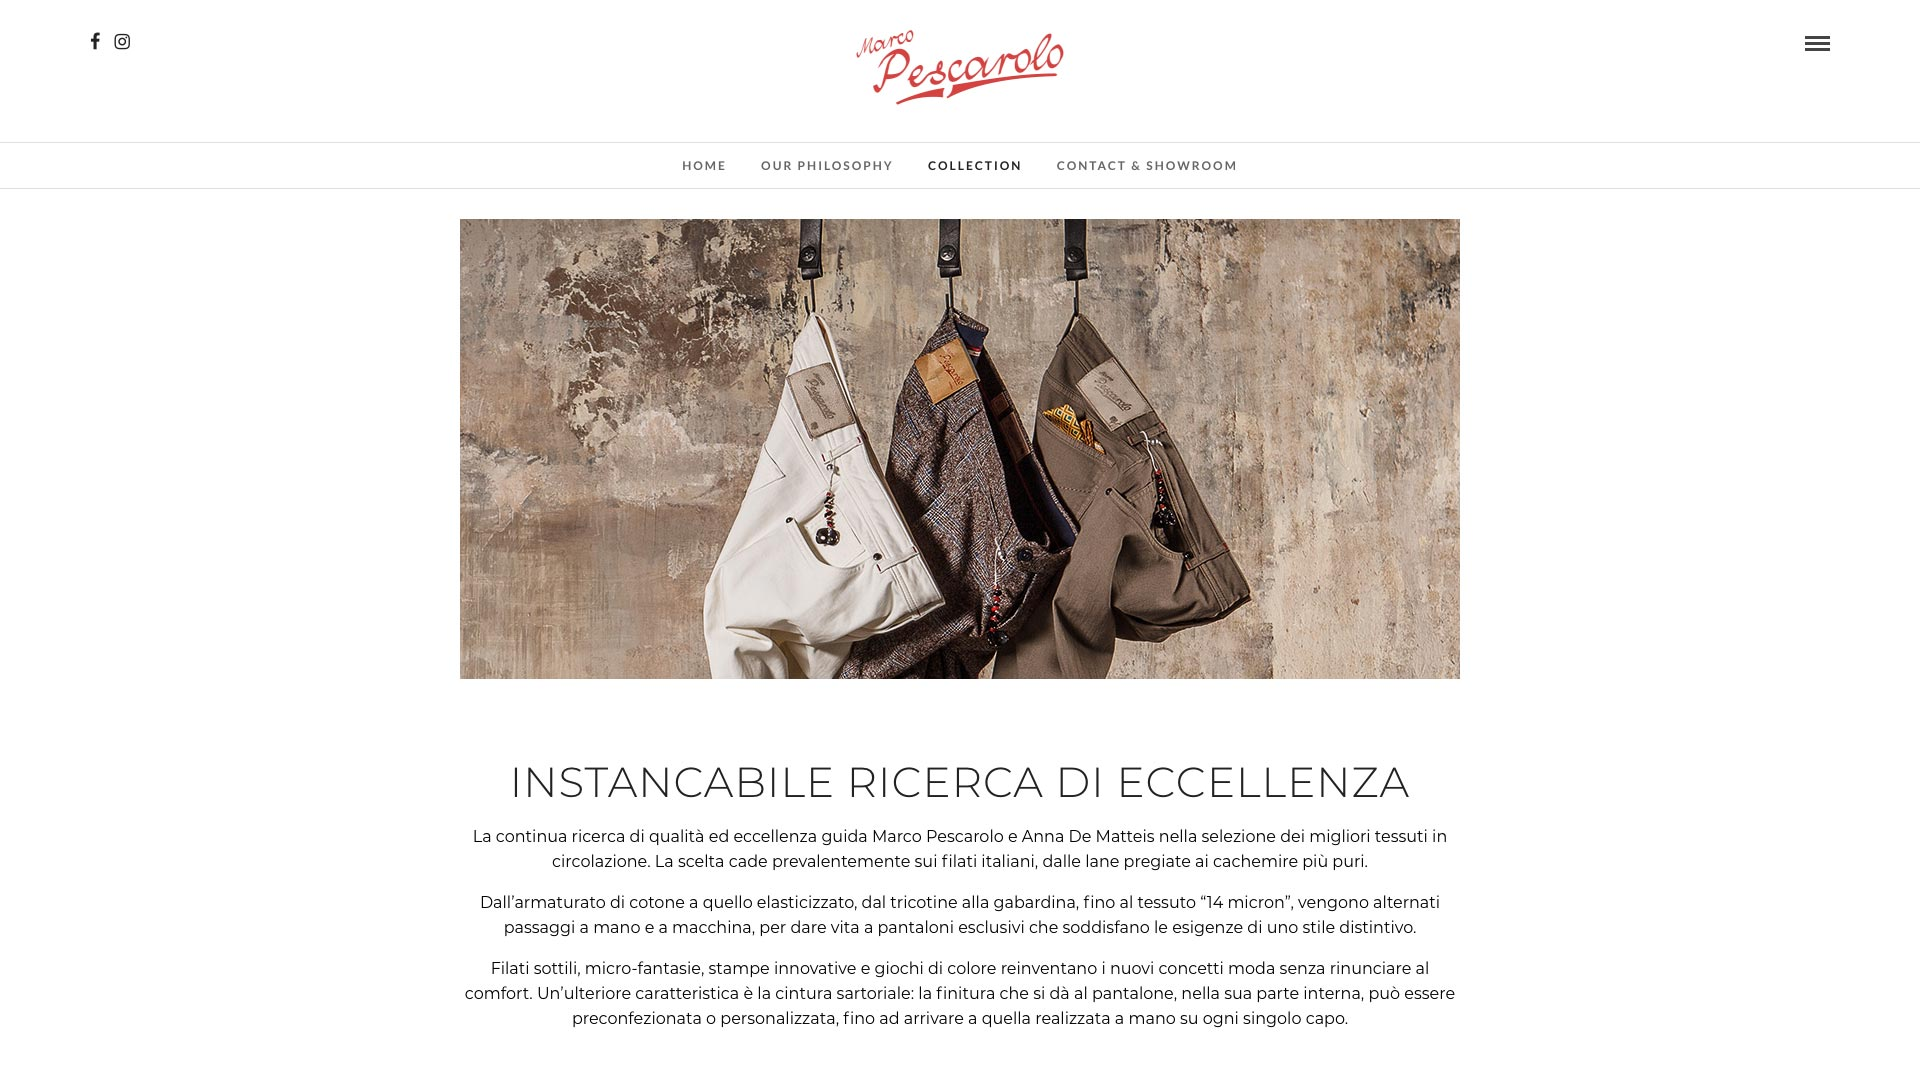 agnzia-comunicazione-napoli-roberto-guariglia-advertising-portfolio-work-fashion-marco-pescarolo-napoli-kiton-sartorio-pantaloni-sartoria-sito-web-4.jpg